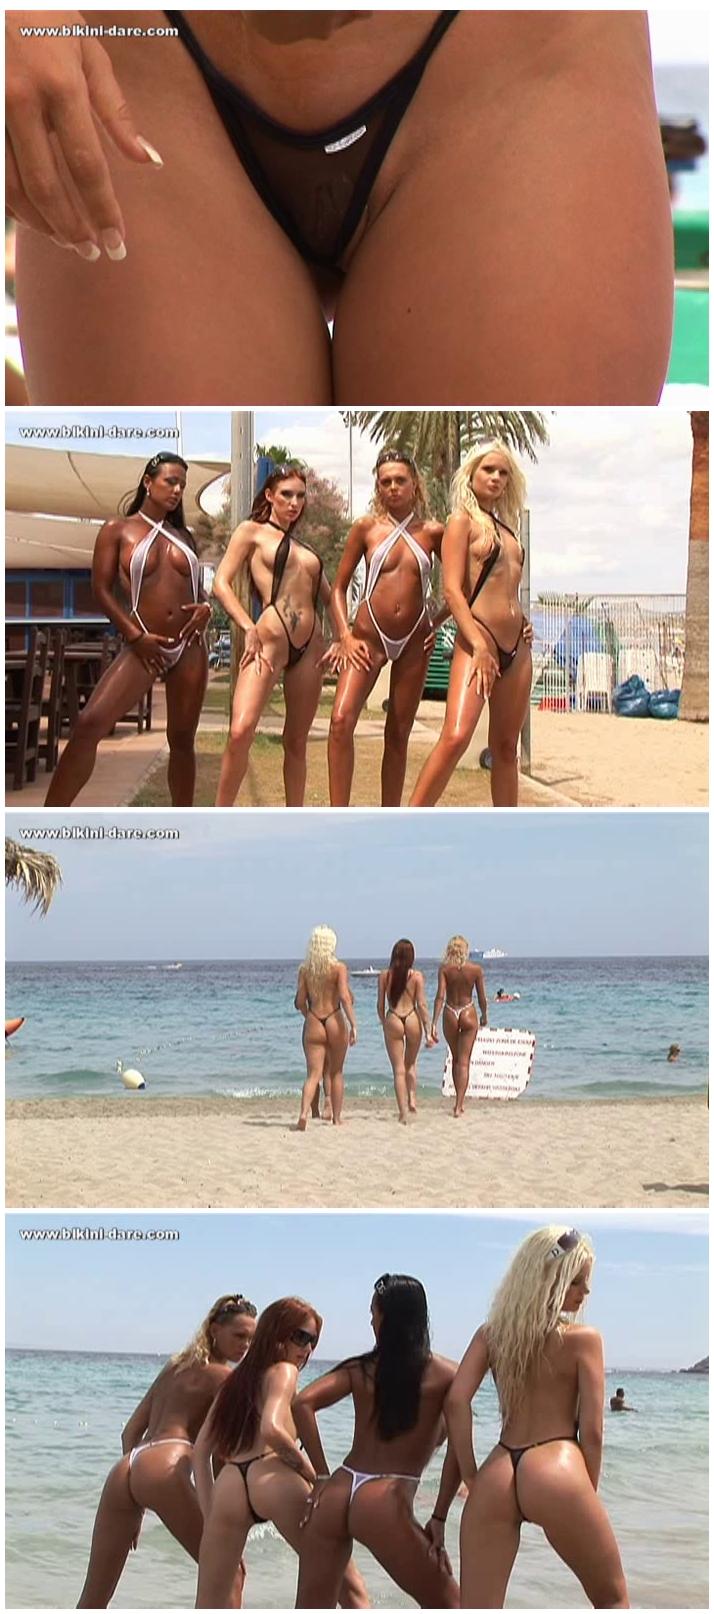 bikini-dare058_cover.jpg